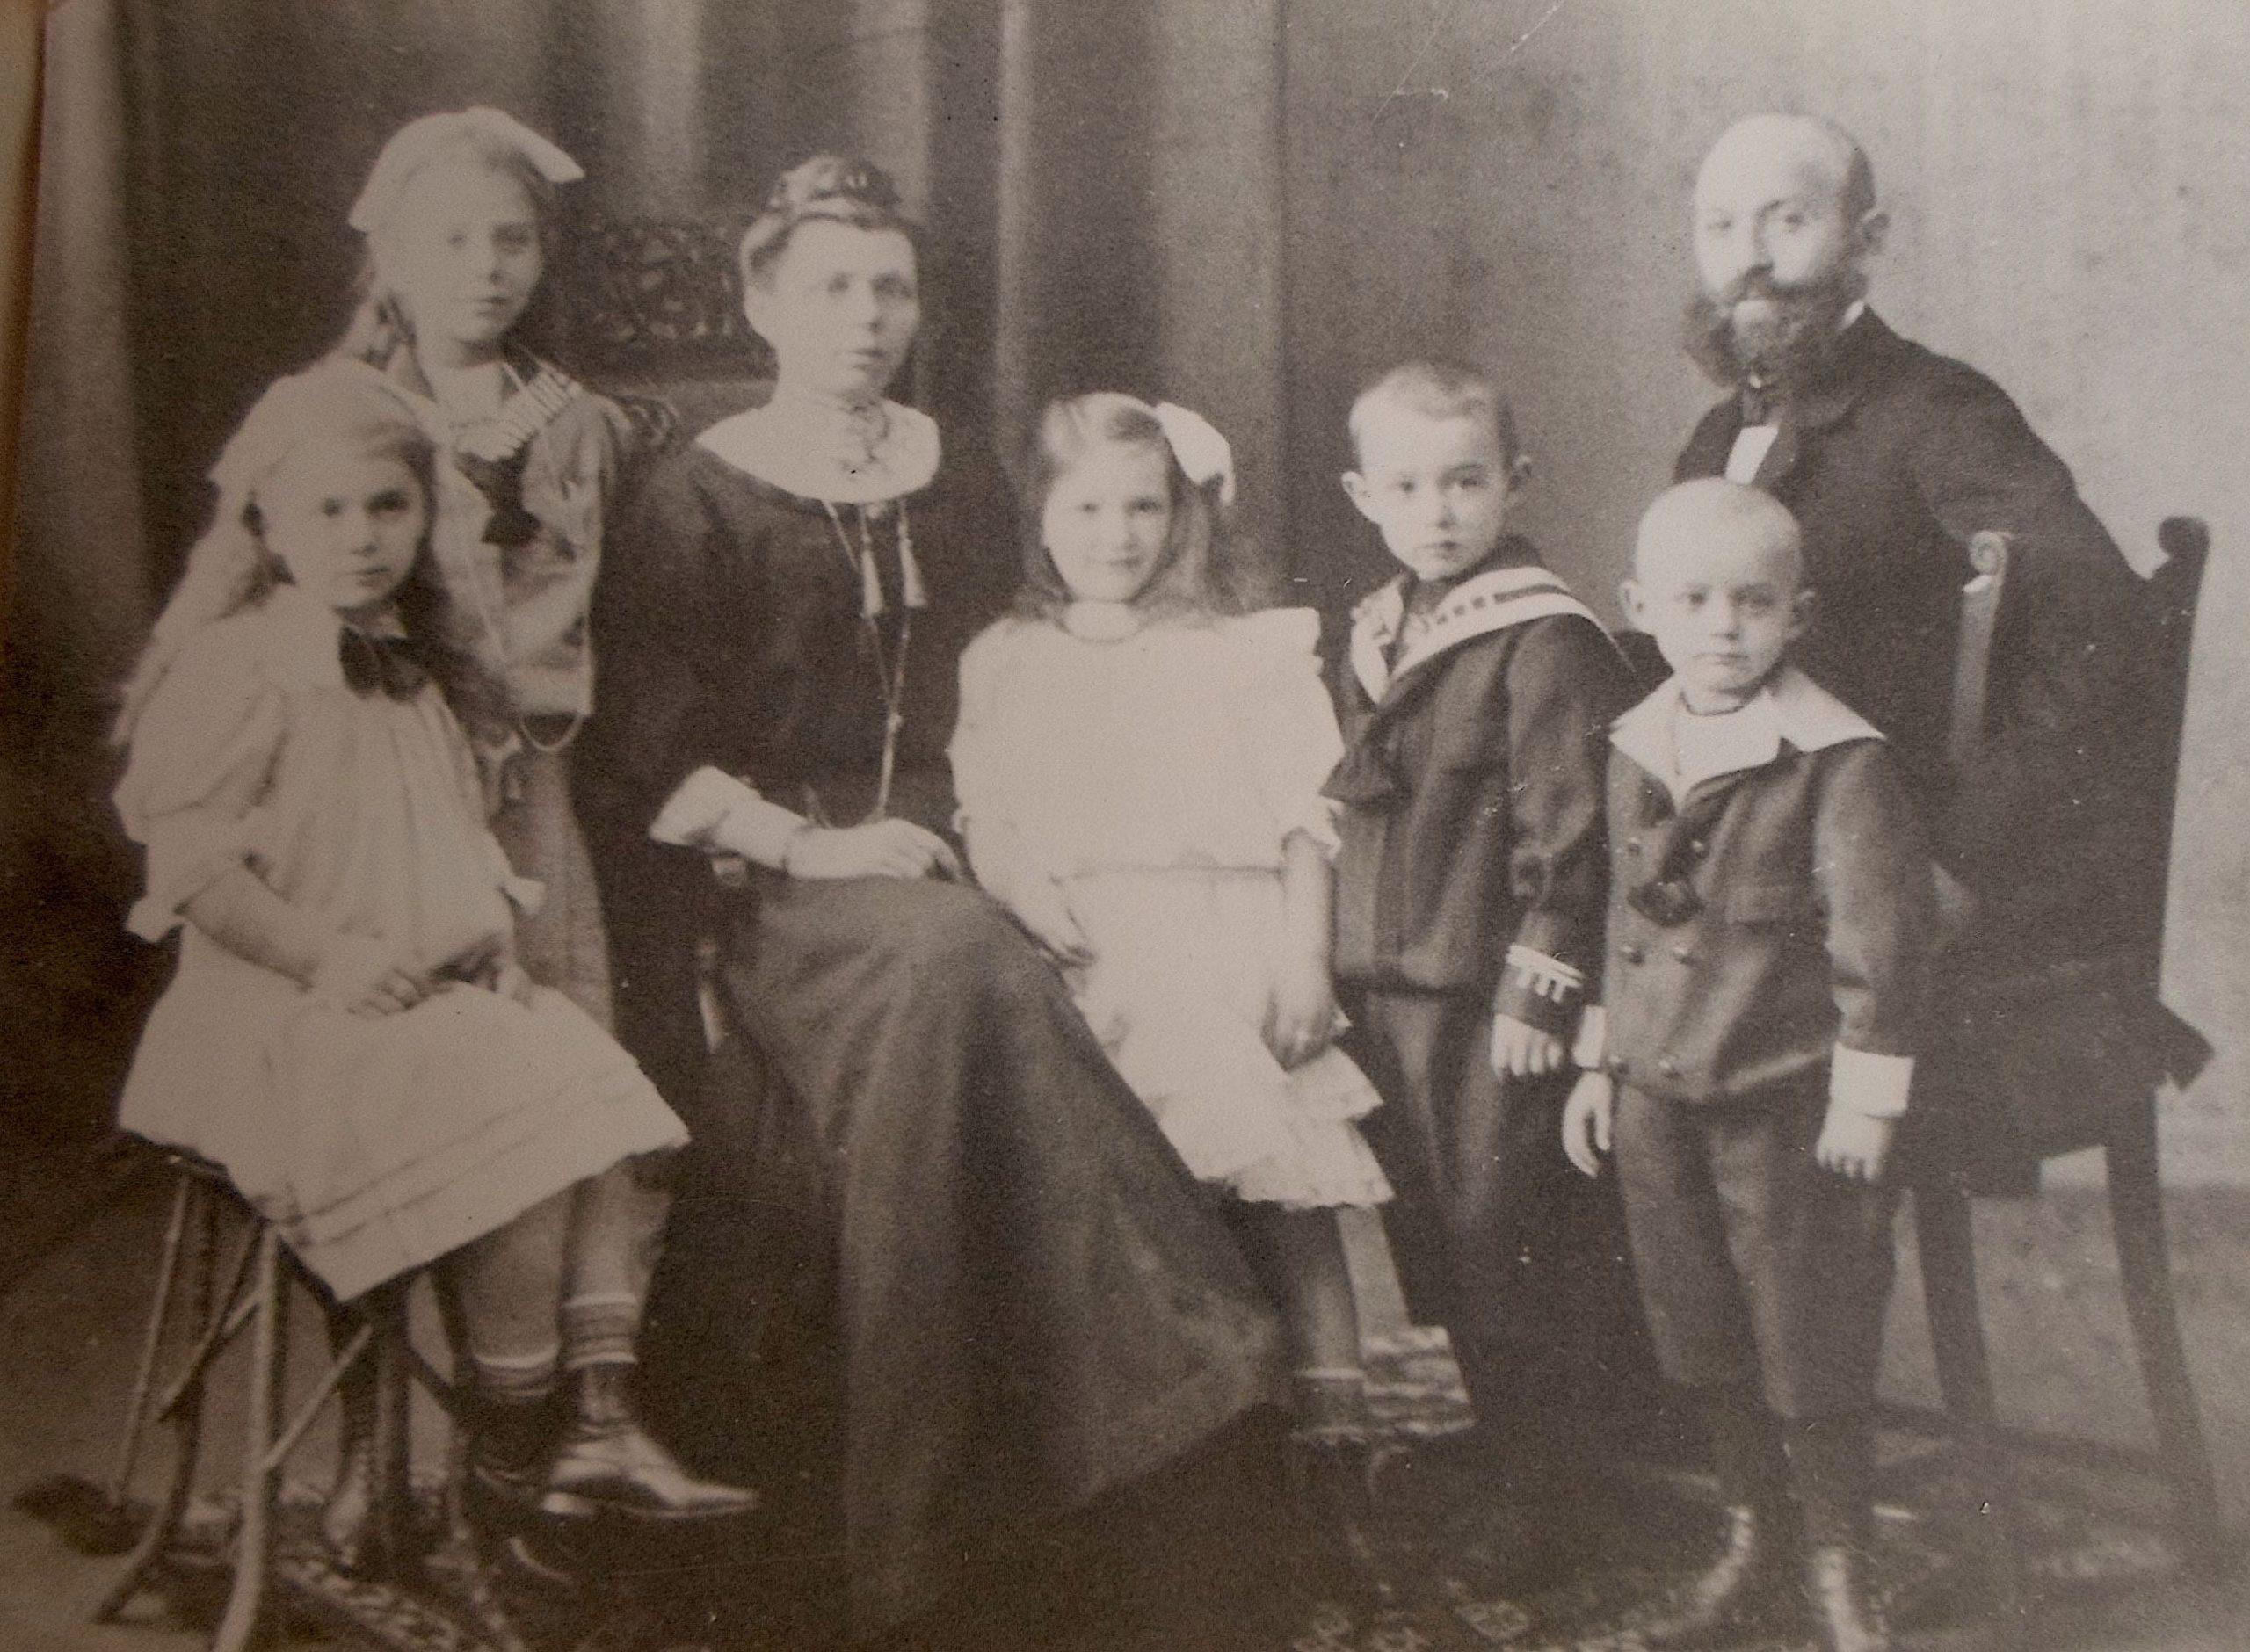 Pfleging family 1909 - Maria Johanna Falkenburg (middle)